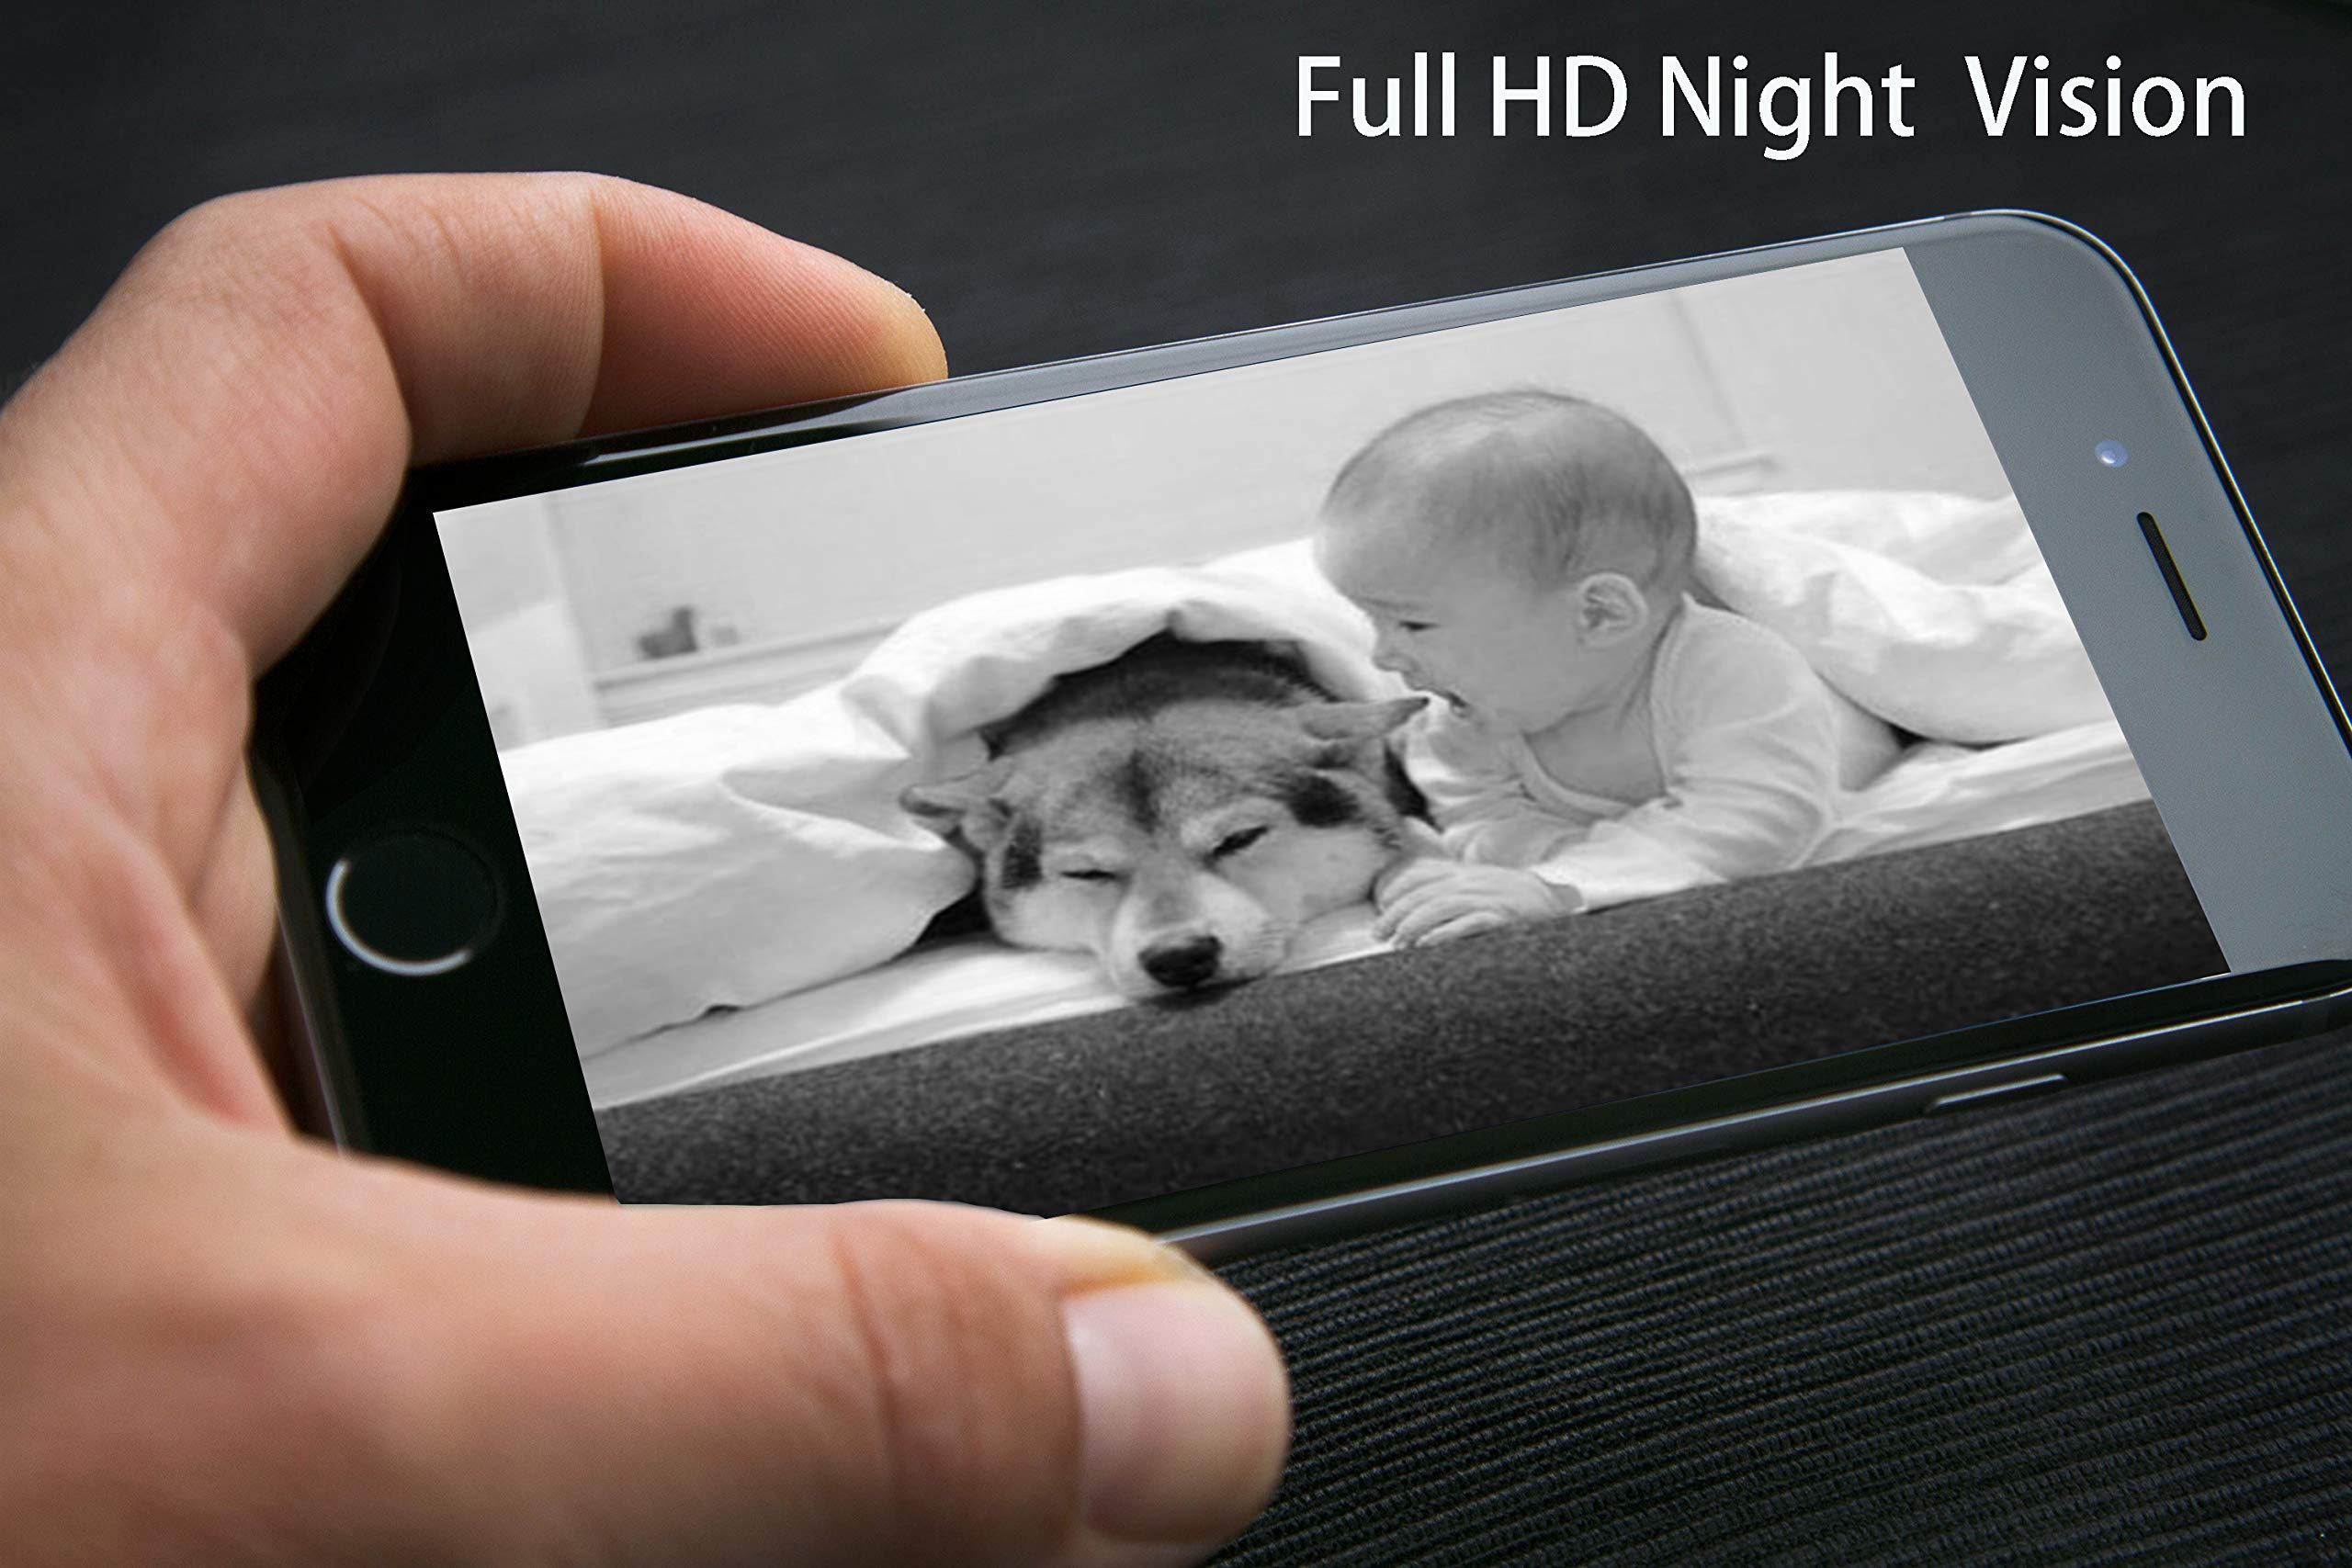 VINSION HD 1080p Pet Camera,Dog Camera 360° Pet Monitor Indoor Cat Camera with Night Vision and Two Way Audio 3